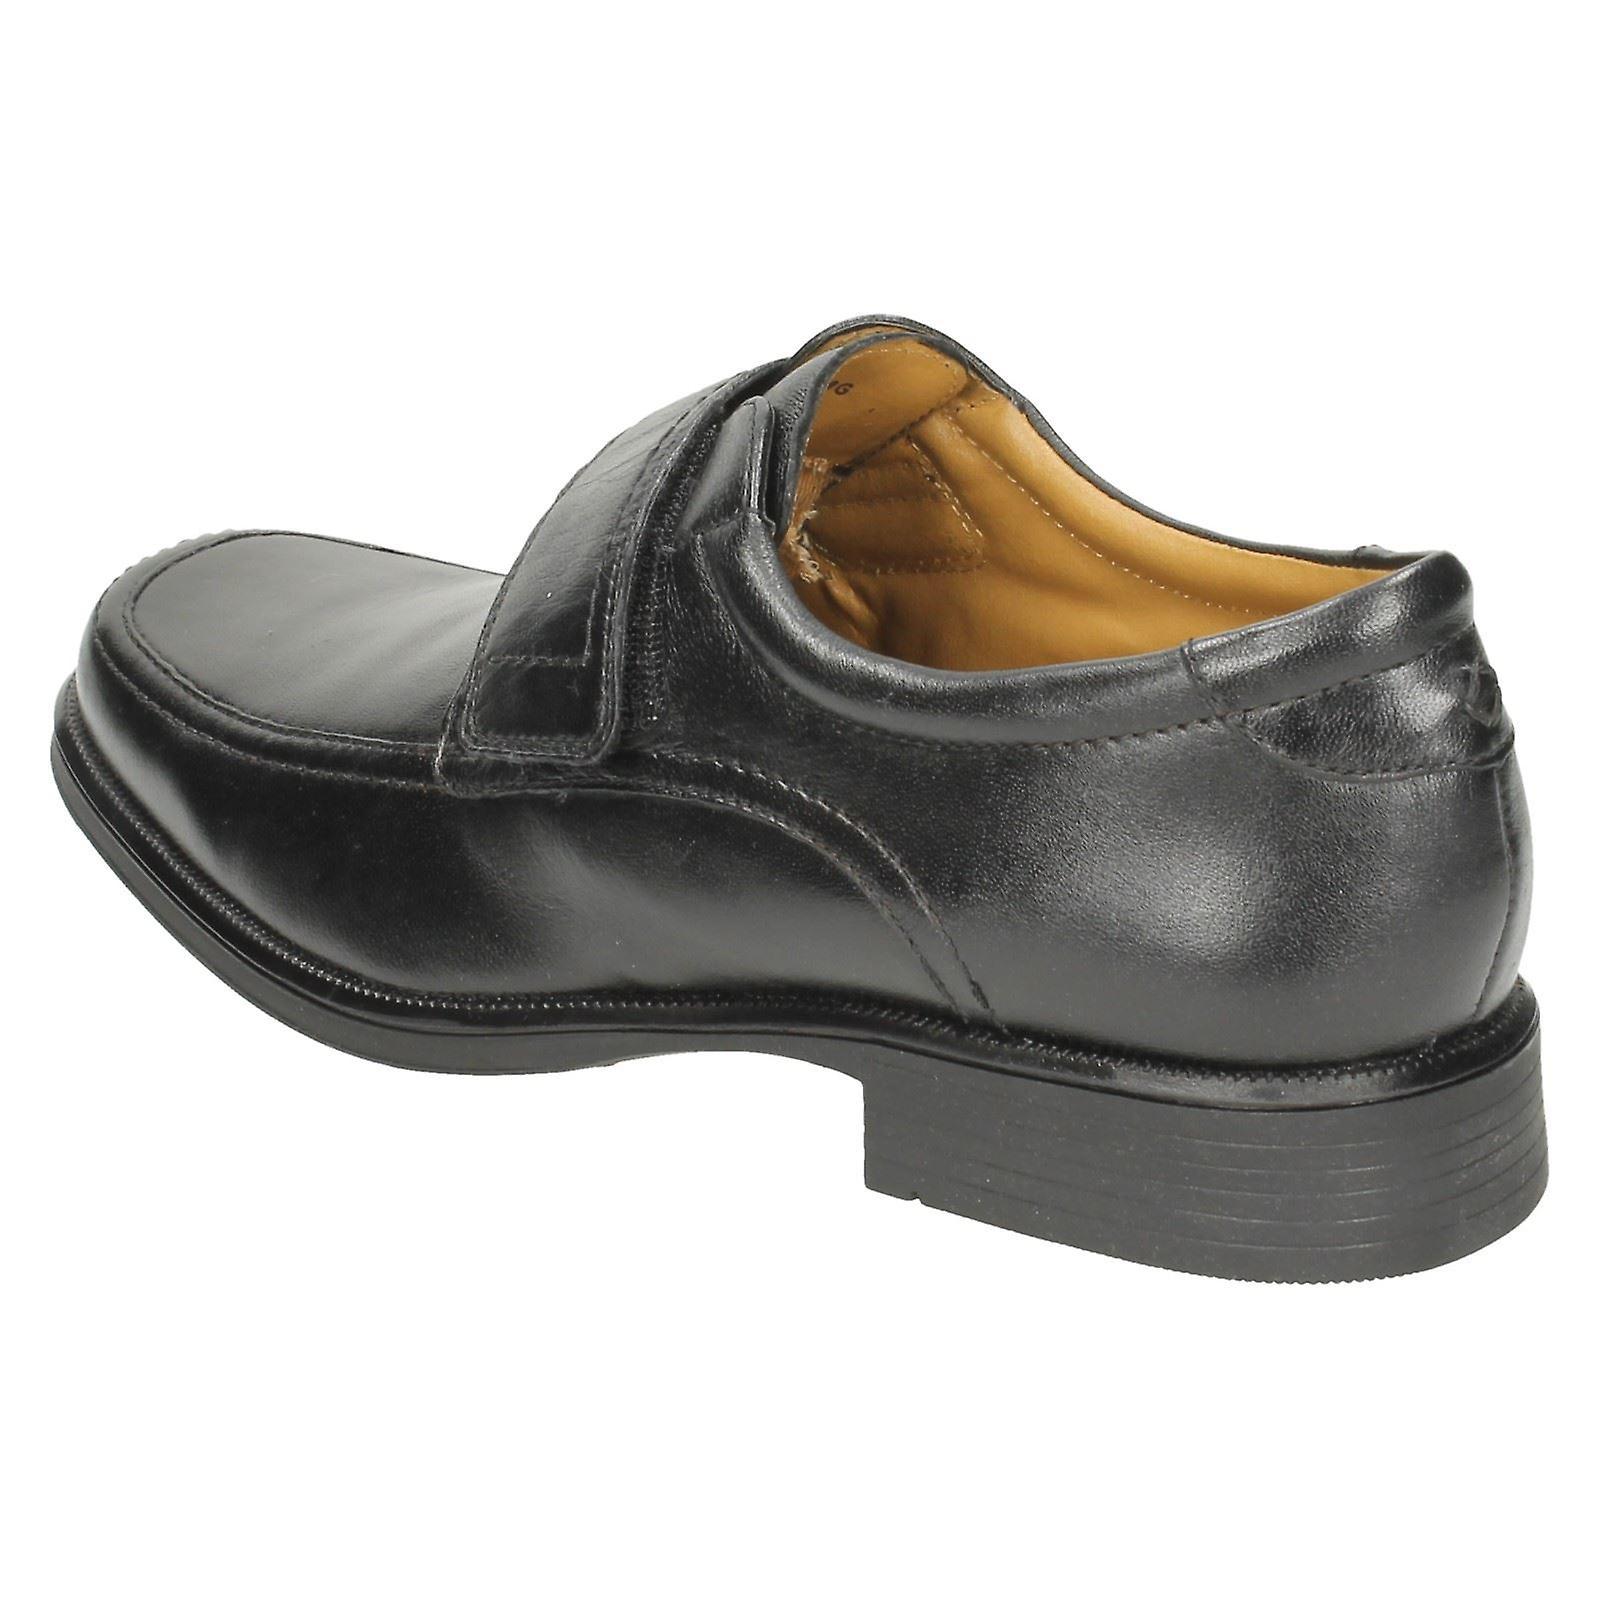 Chaussures cuir Smart Mens Clarks hisser Roll